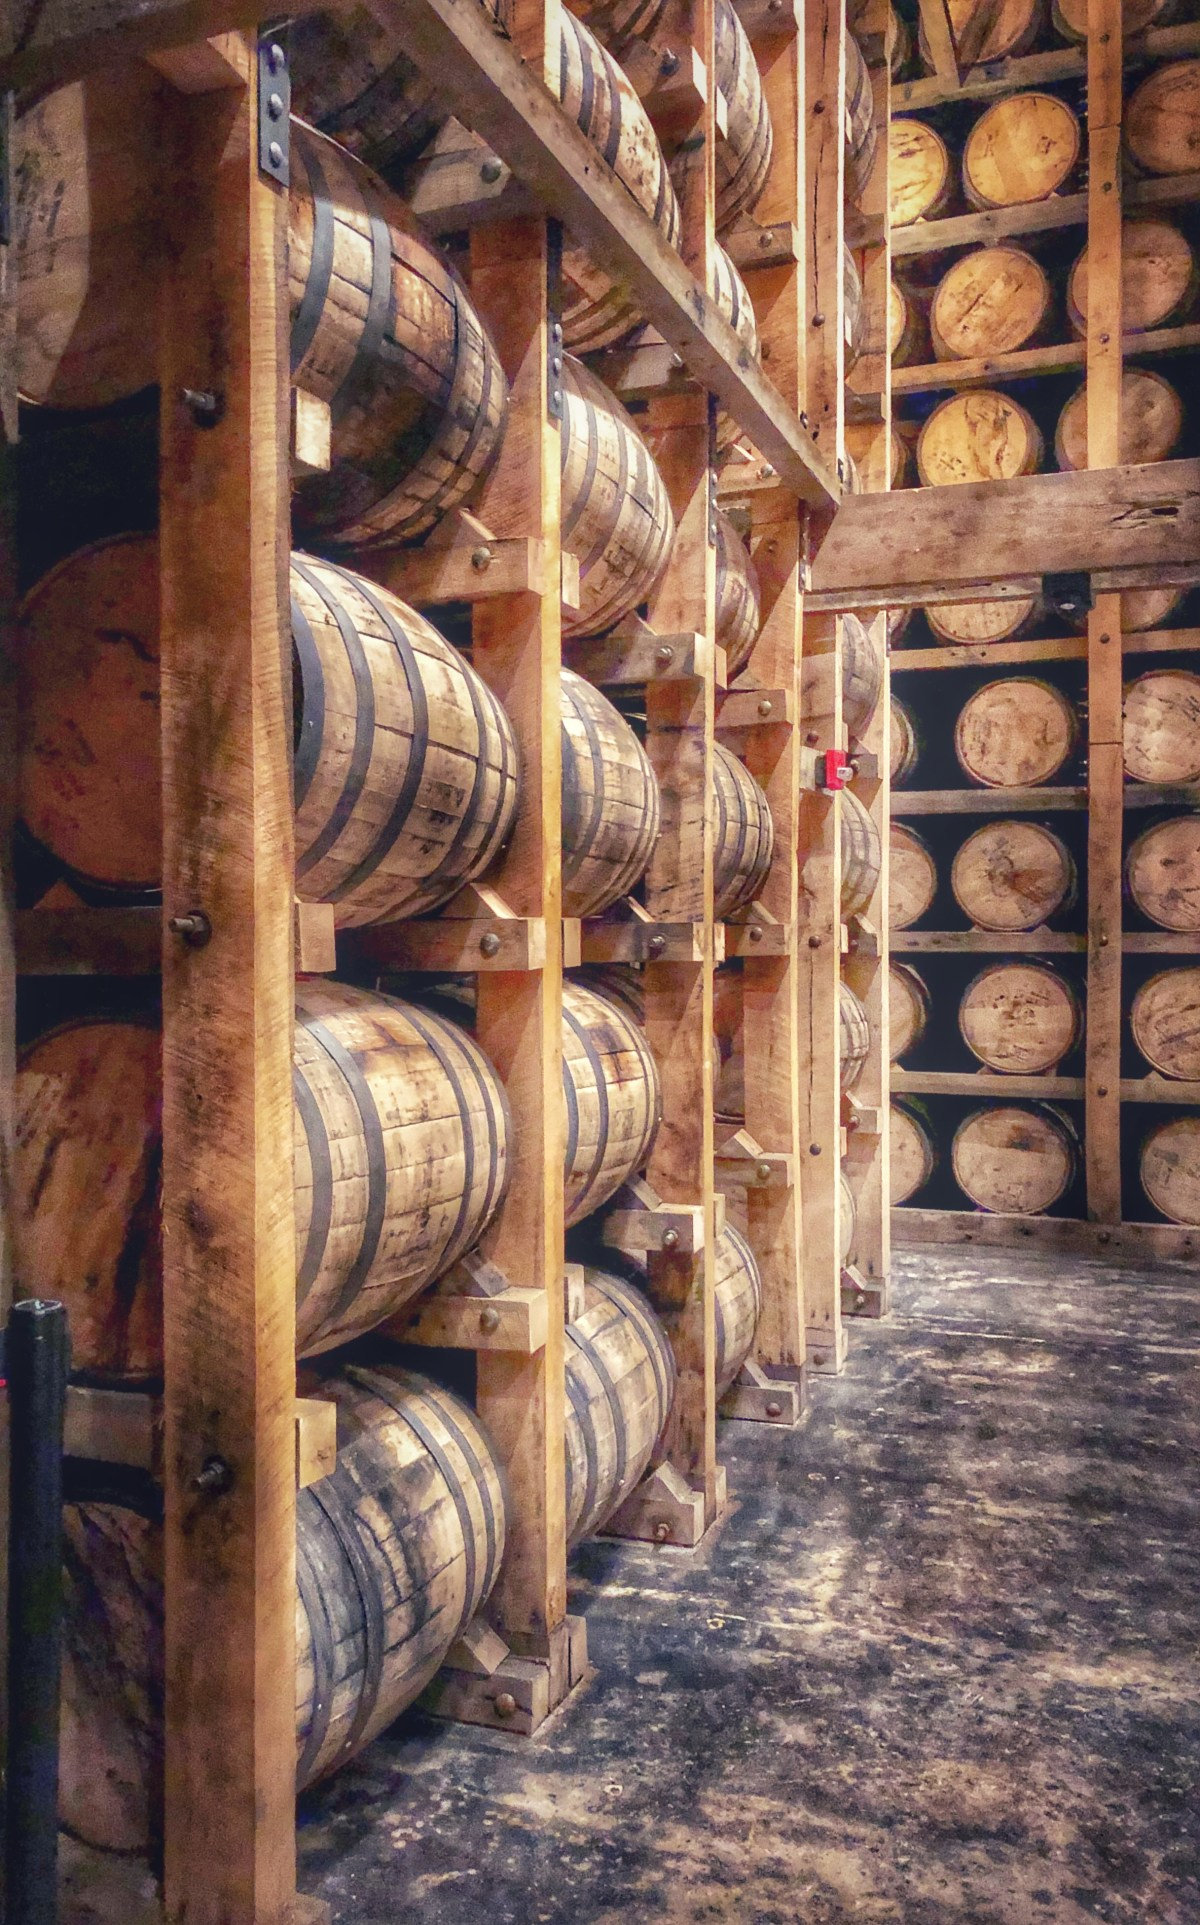 Jack Daniels Distillery | Lynchburg, TN #barrelhouse #jackdanielstour #jackdanielsdistillery #lynchburgtn #nashvilletours